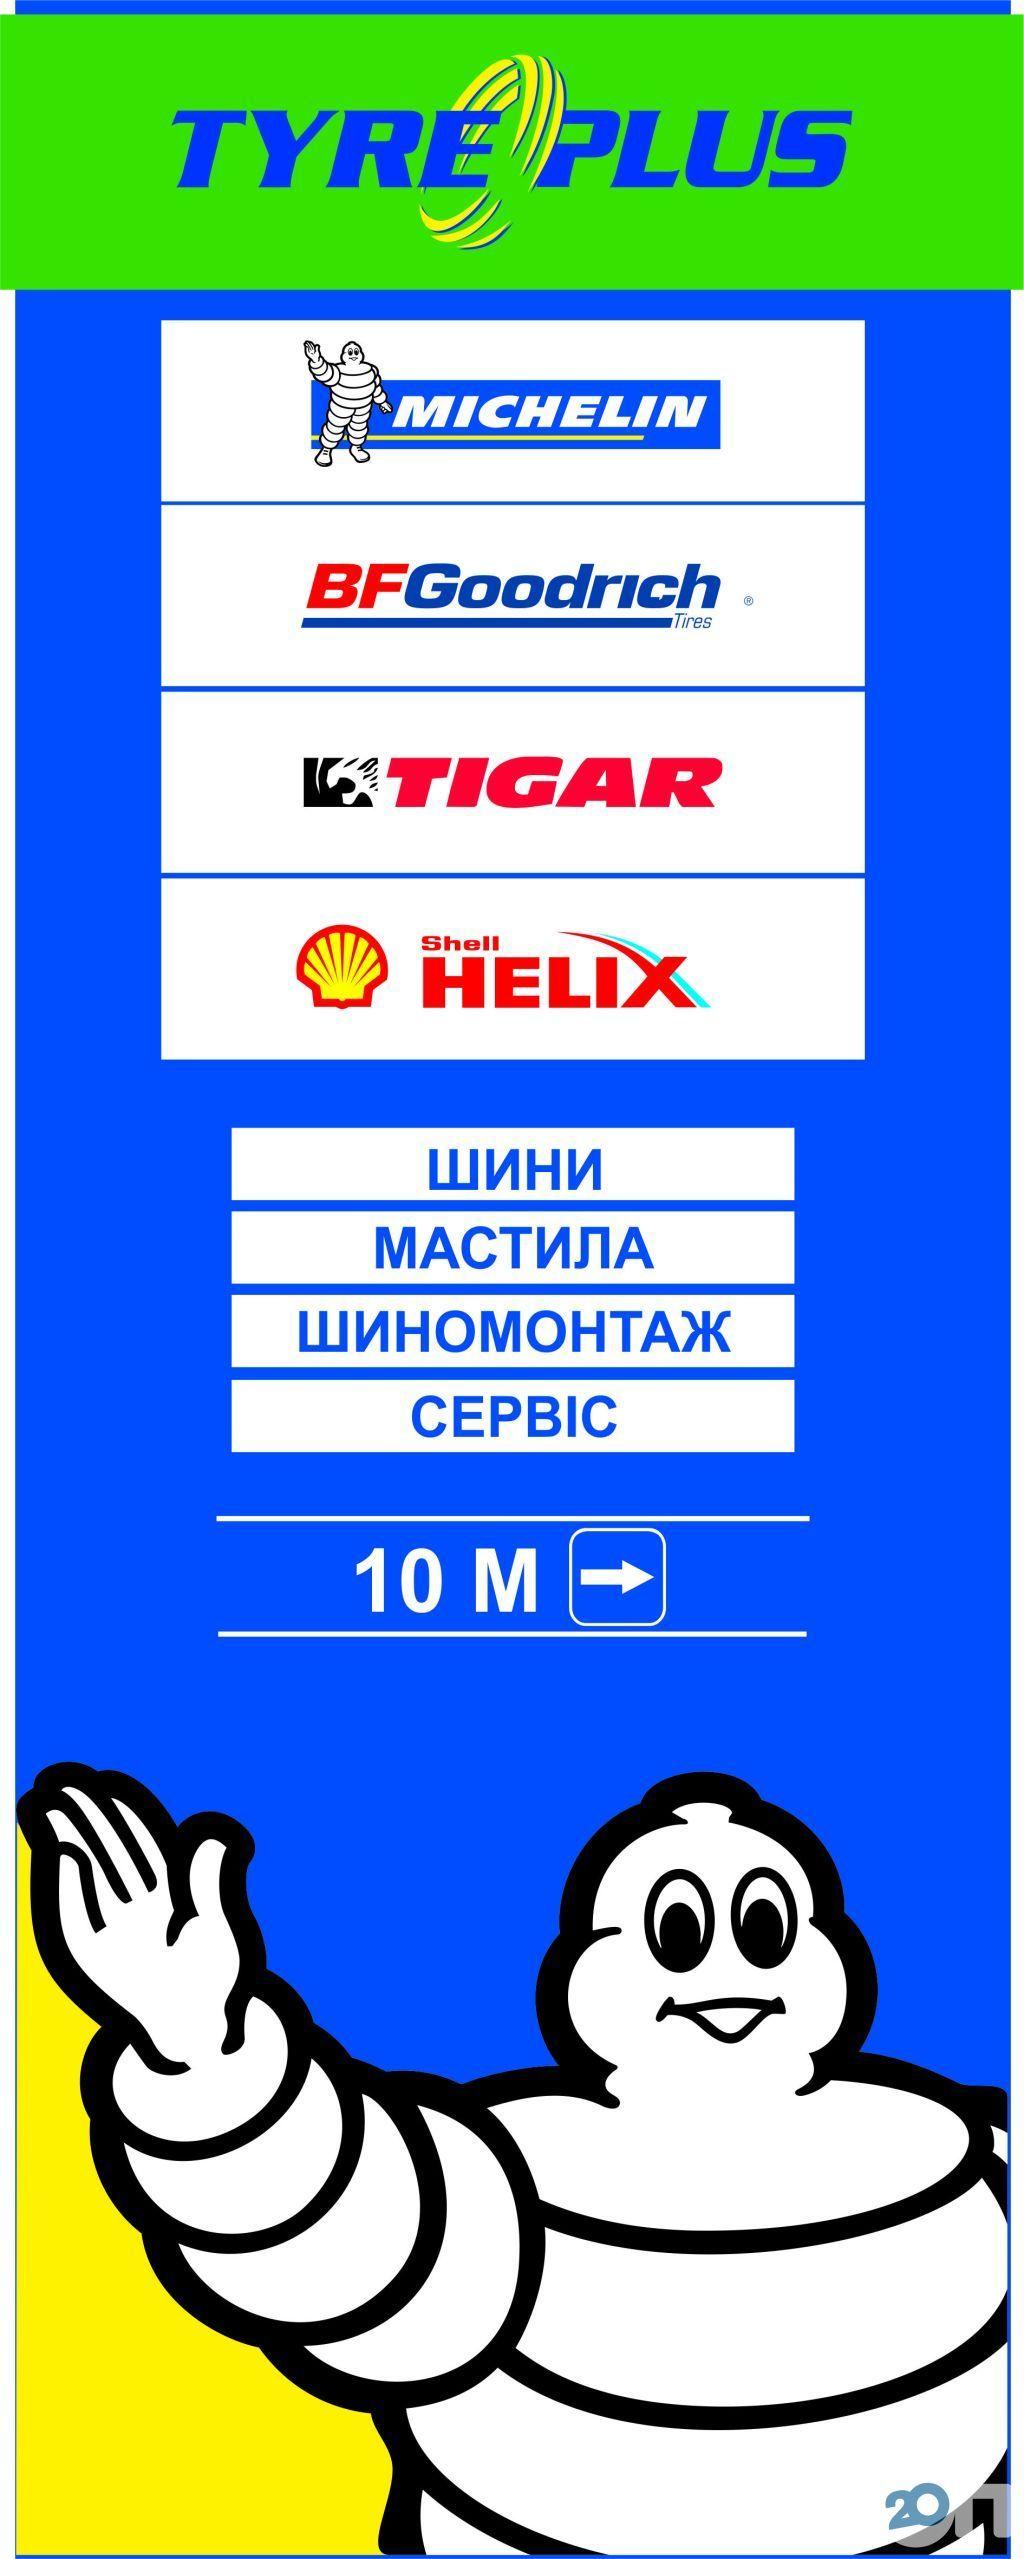 "Шинный сервисный центр Tyreplus Michelin ООО ""ТРАНСФЕРО"" - фото 2"